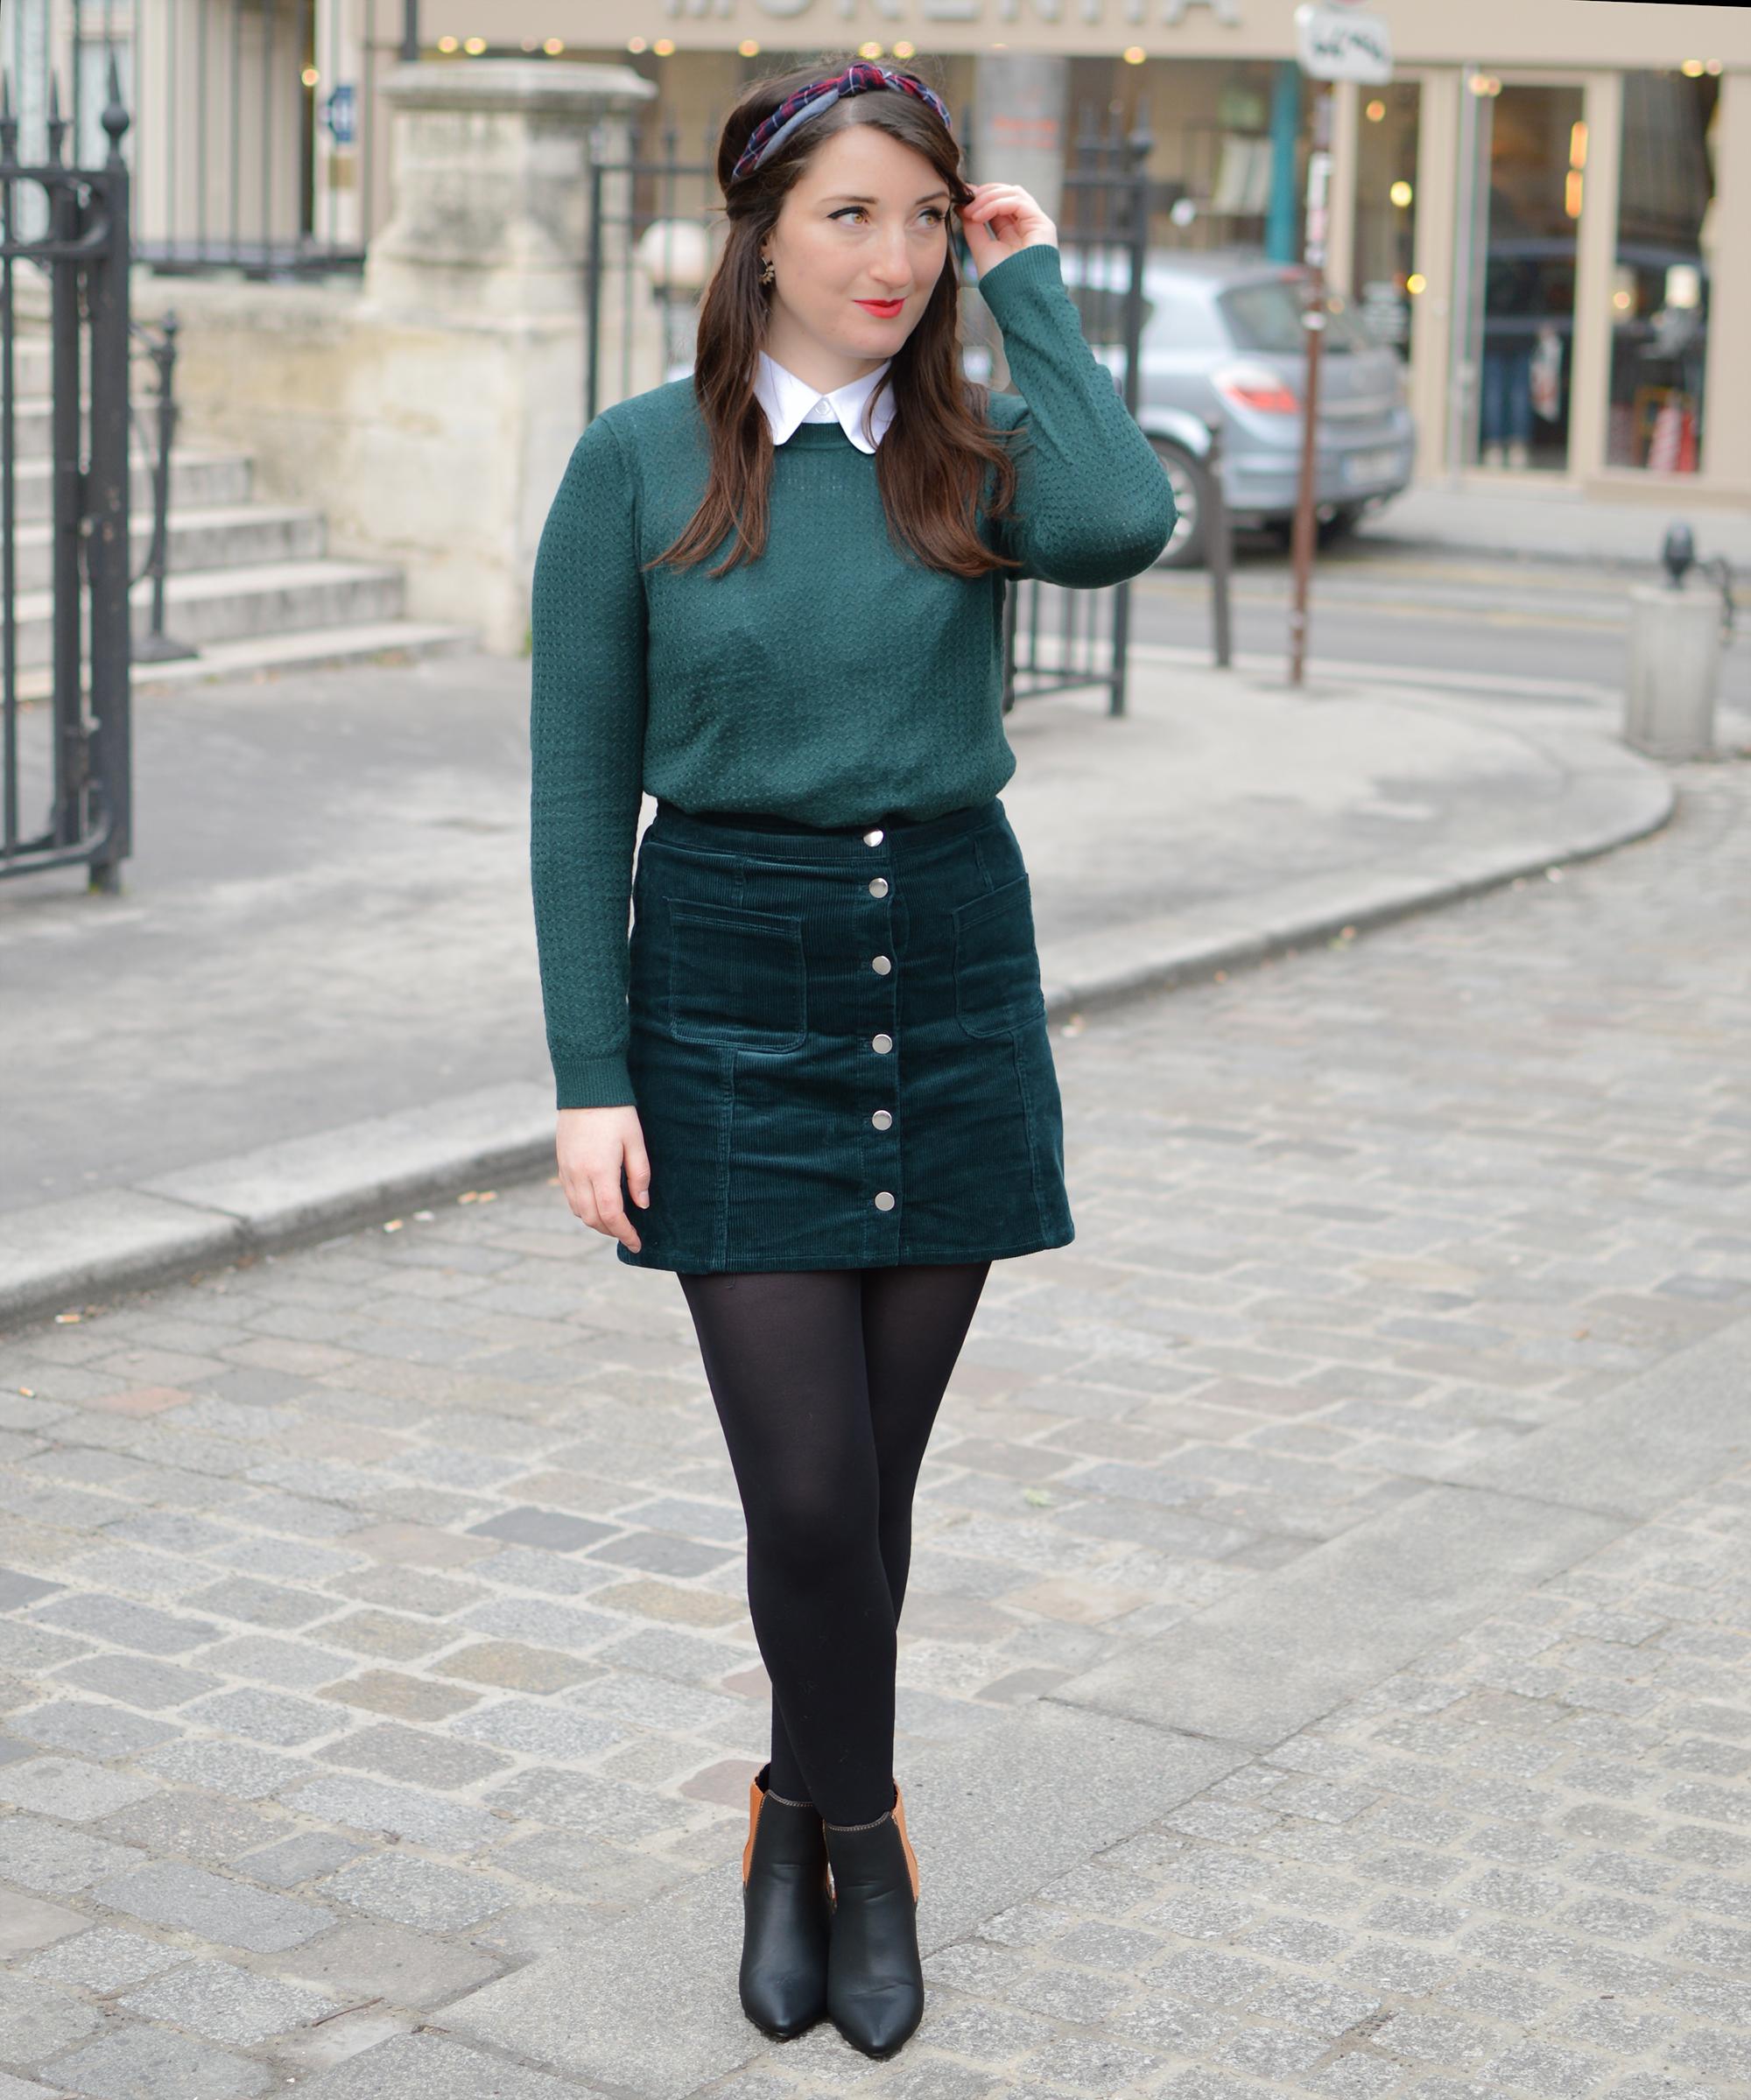 vert-sapin-jupe-col-festonne-look